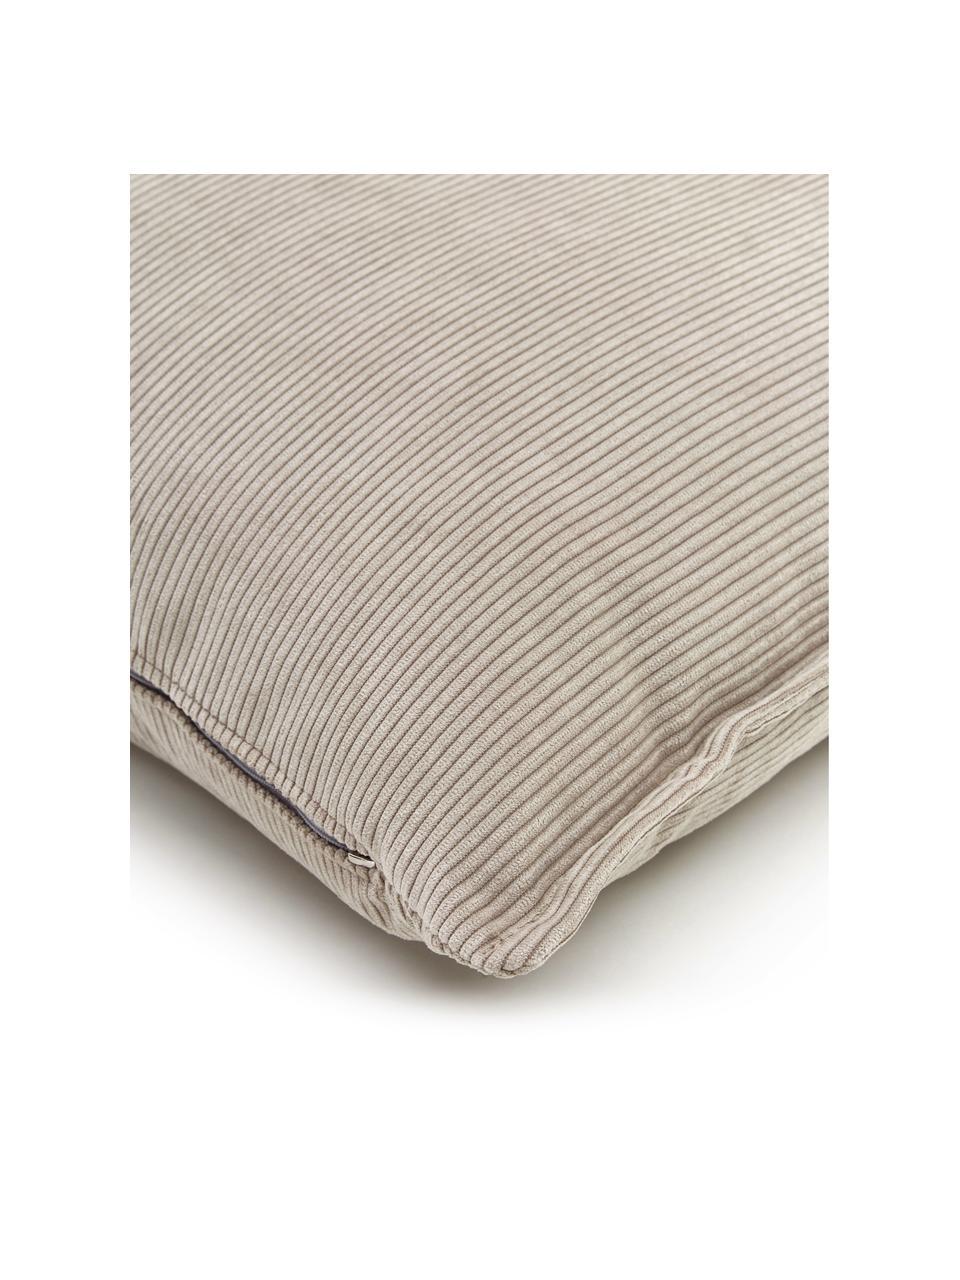 Cuscino arredo in velluto a coste beige Lennon, Rivestimento: velluto a coste (92% poli, Beige, Larg. 60 x Lung. 60 cm